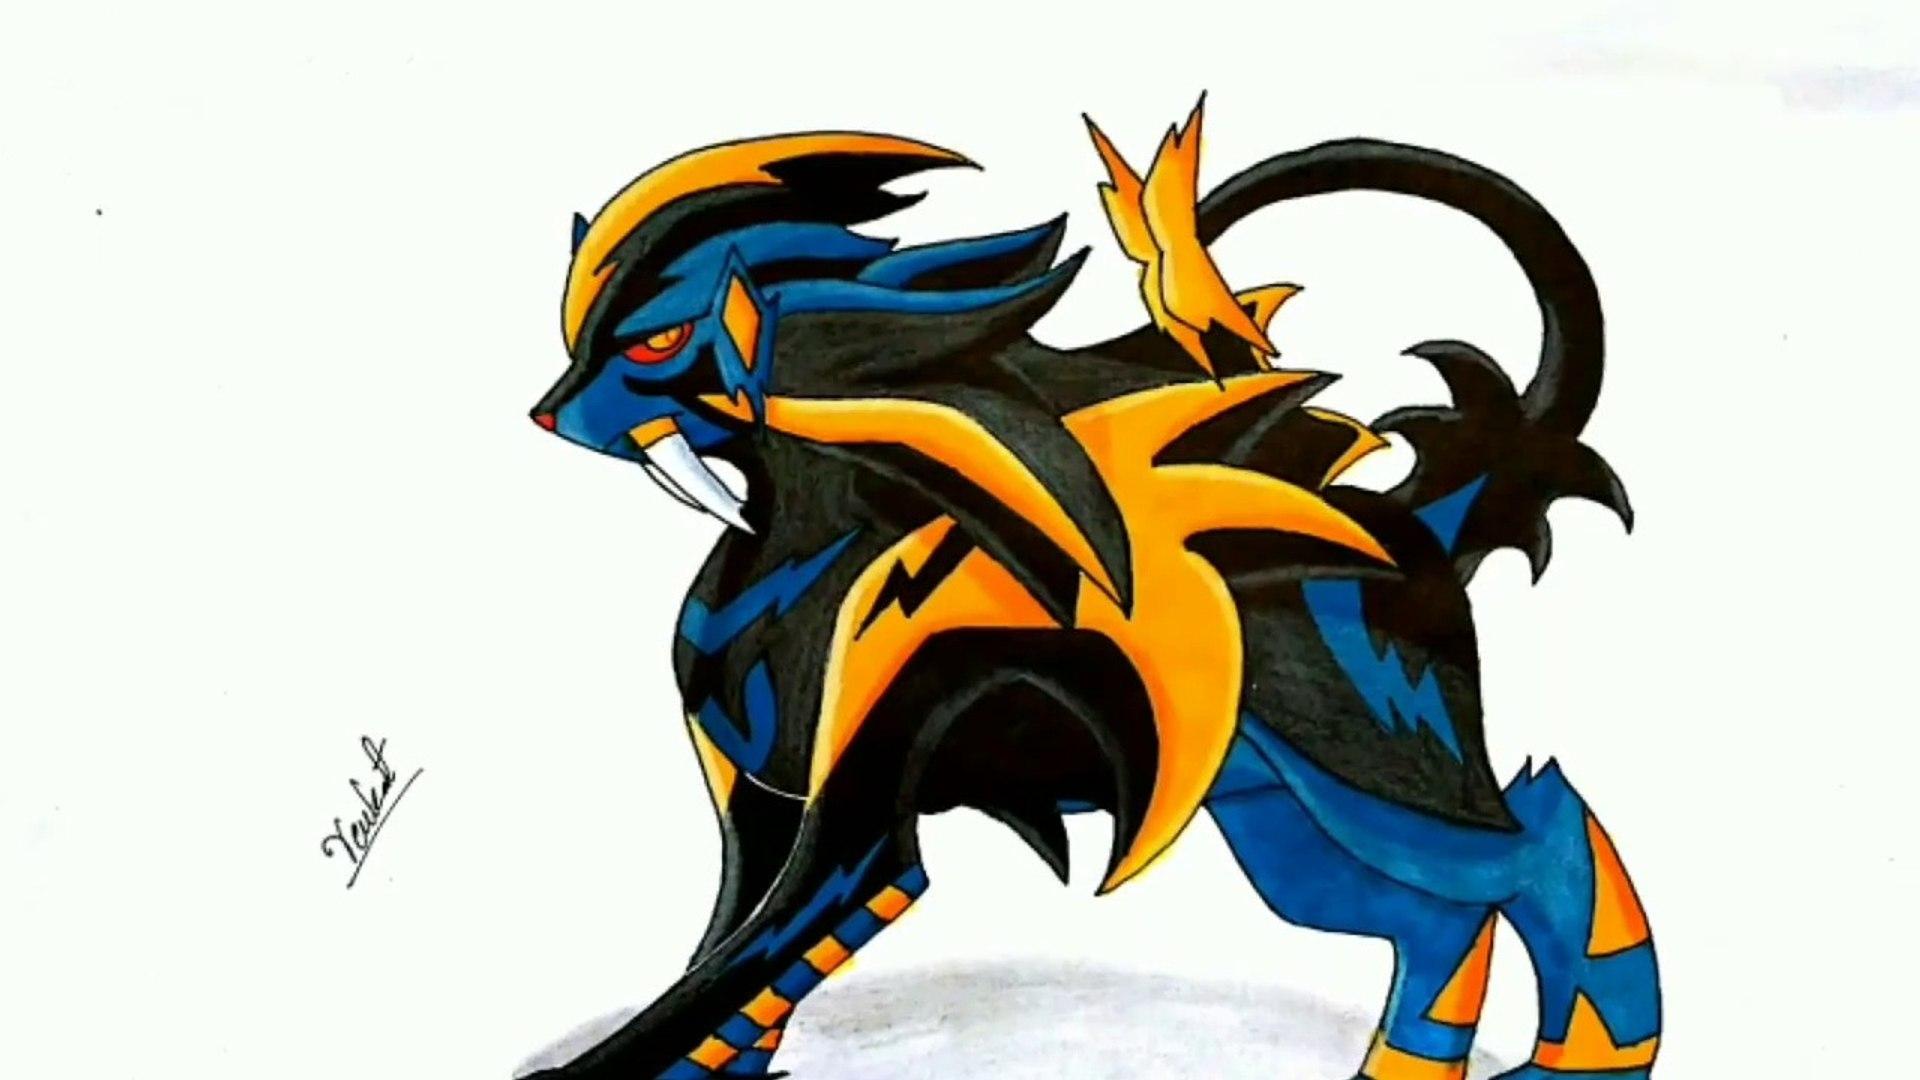 Mega Luxray Pokemon Drawing 1920x1080 Wallpaper Teahub Io